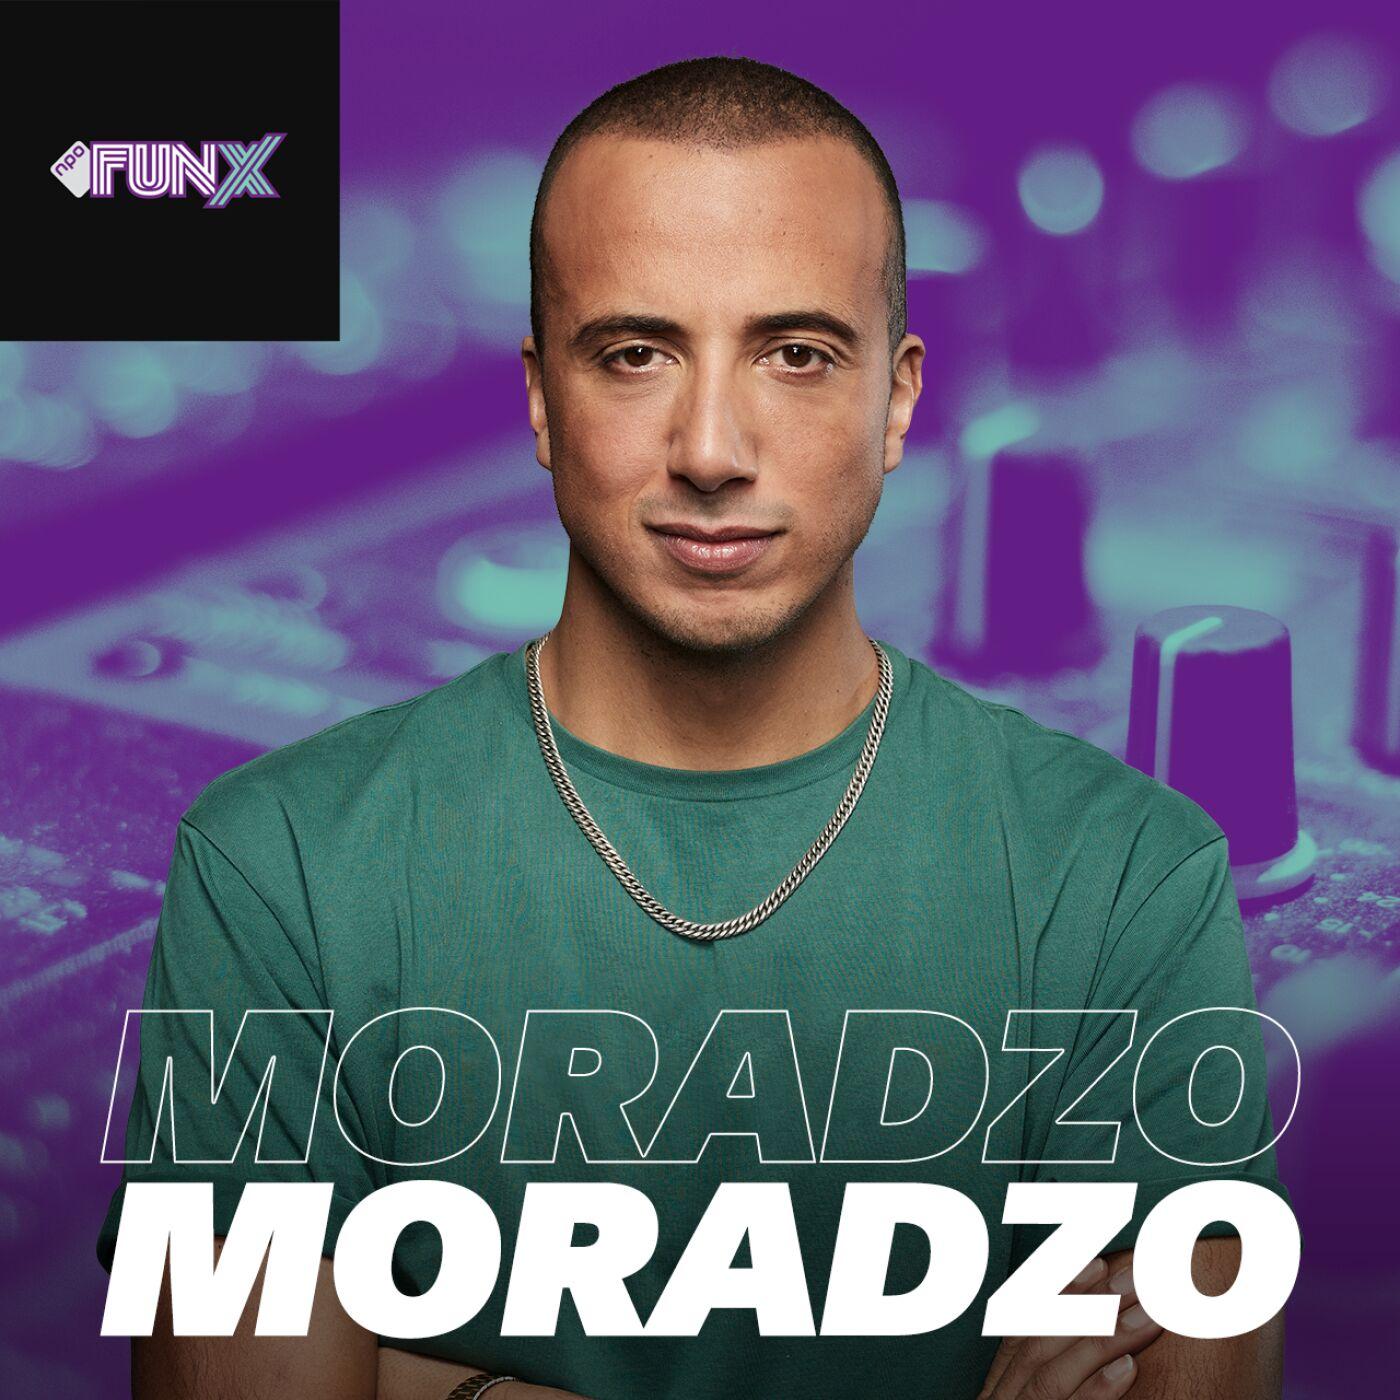 FunX - In The Mix: Moradzo logo